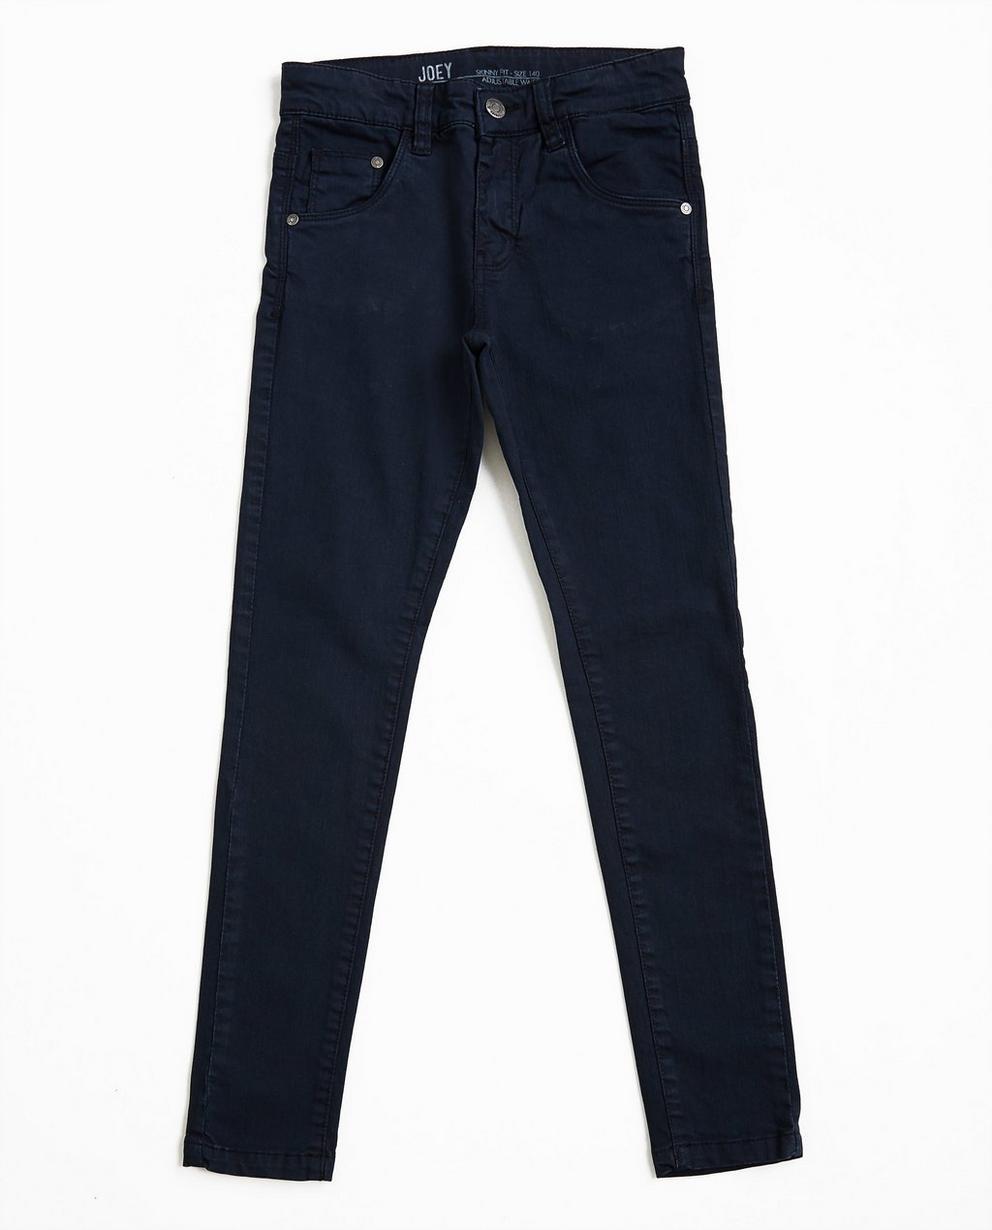 Jeans bleu nuit  - skinny fit - JBC